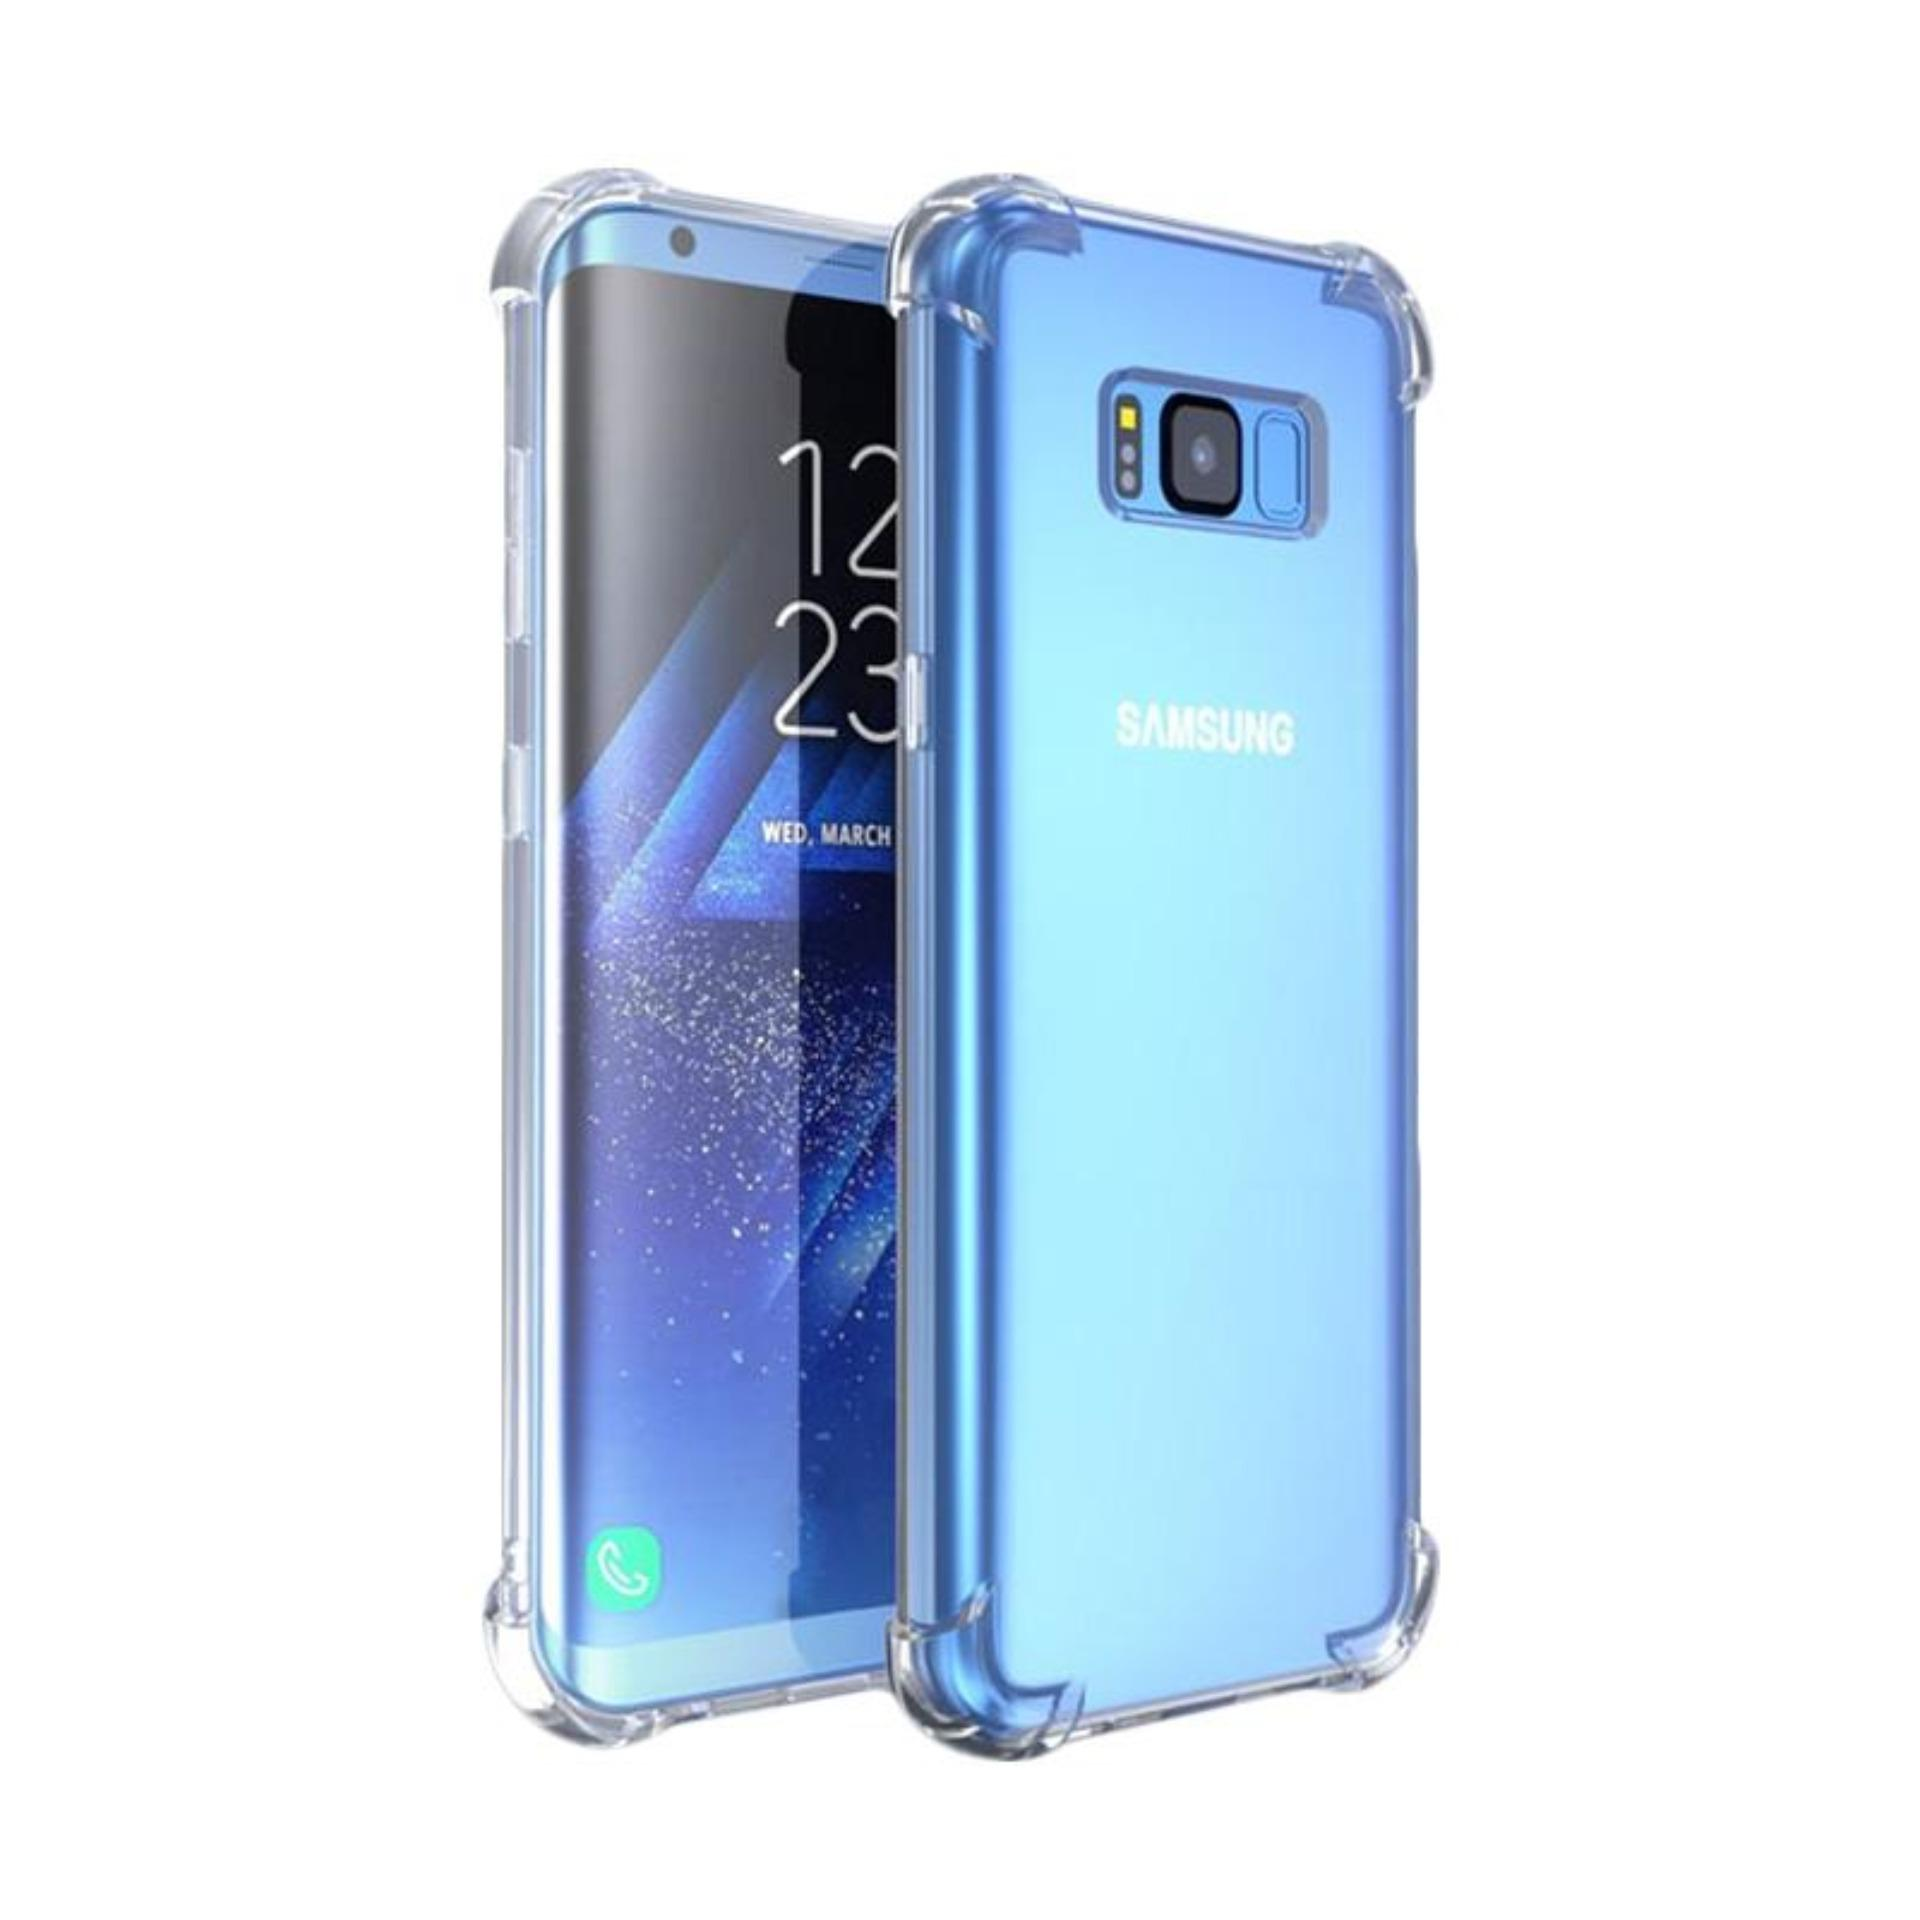 ShockCase for Samsung Galaxy S8 (G950) / 4G LTE / Duos | Premium Softcase